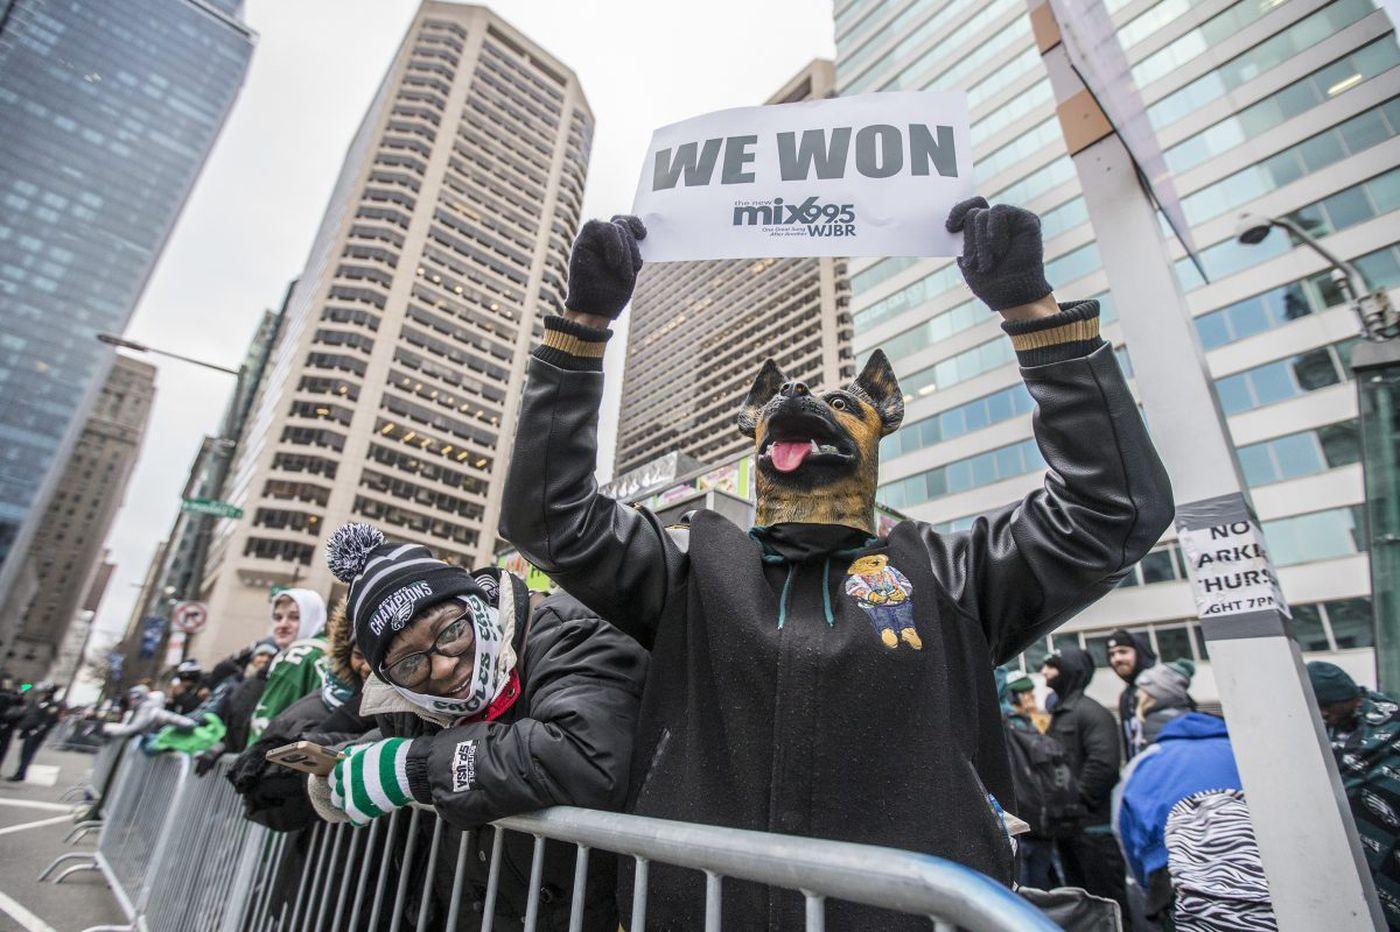 Masses of Eagles fans descend upon Philadelphia as the city's first Super Bowl parade begins